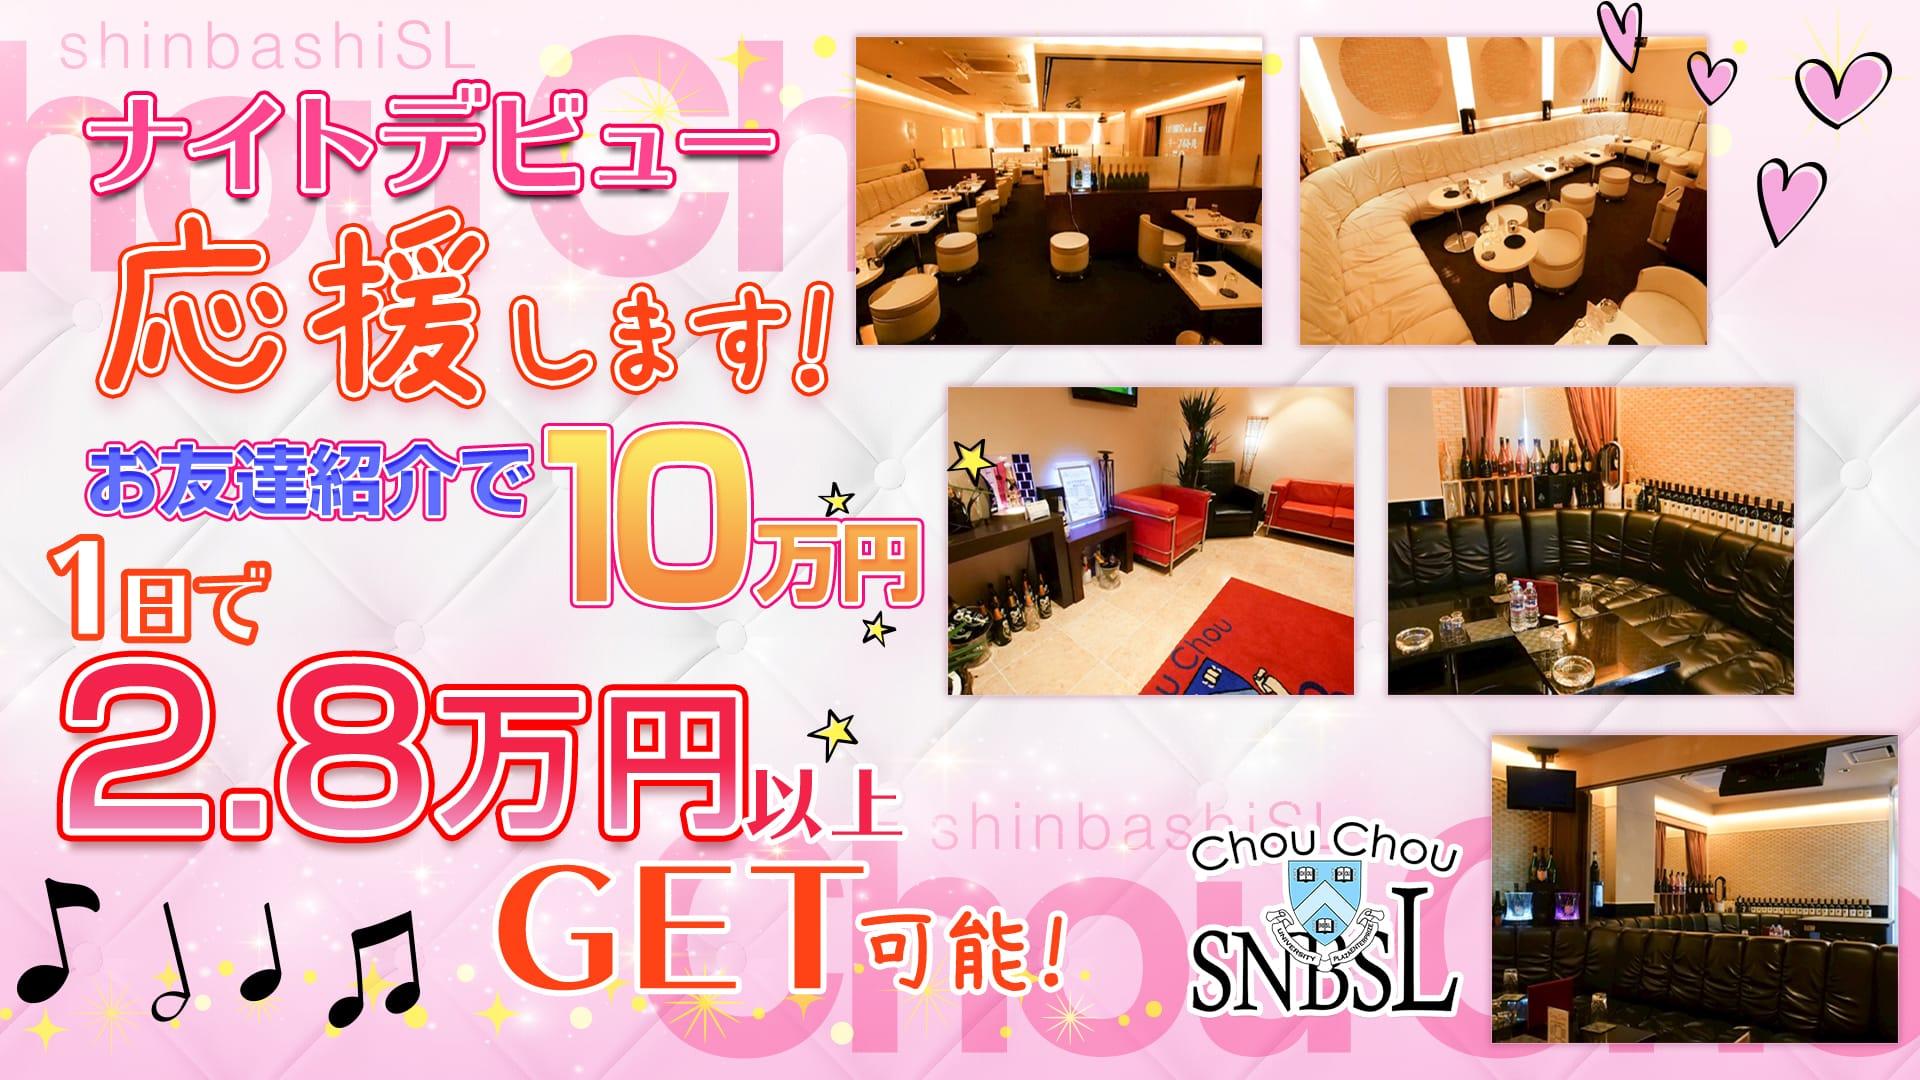 ChouChou 新橋SL店(シュシュ) 新橋キャバクラ TOP画像